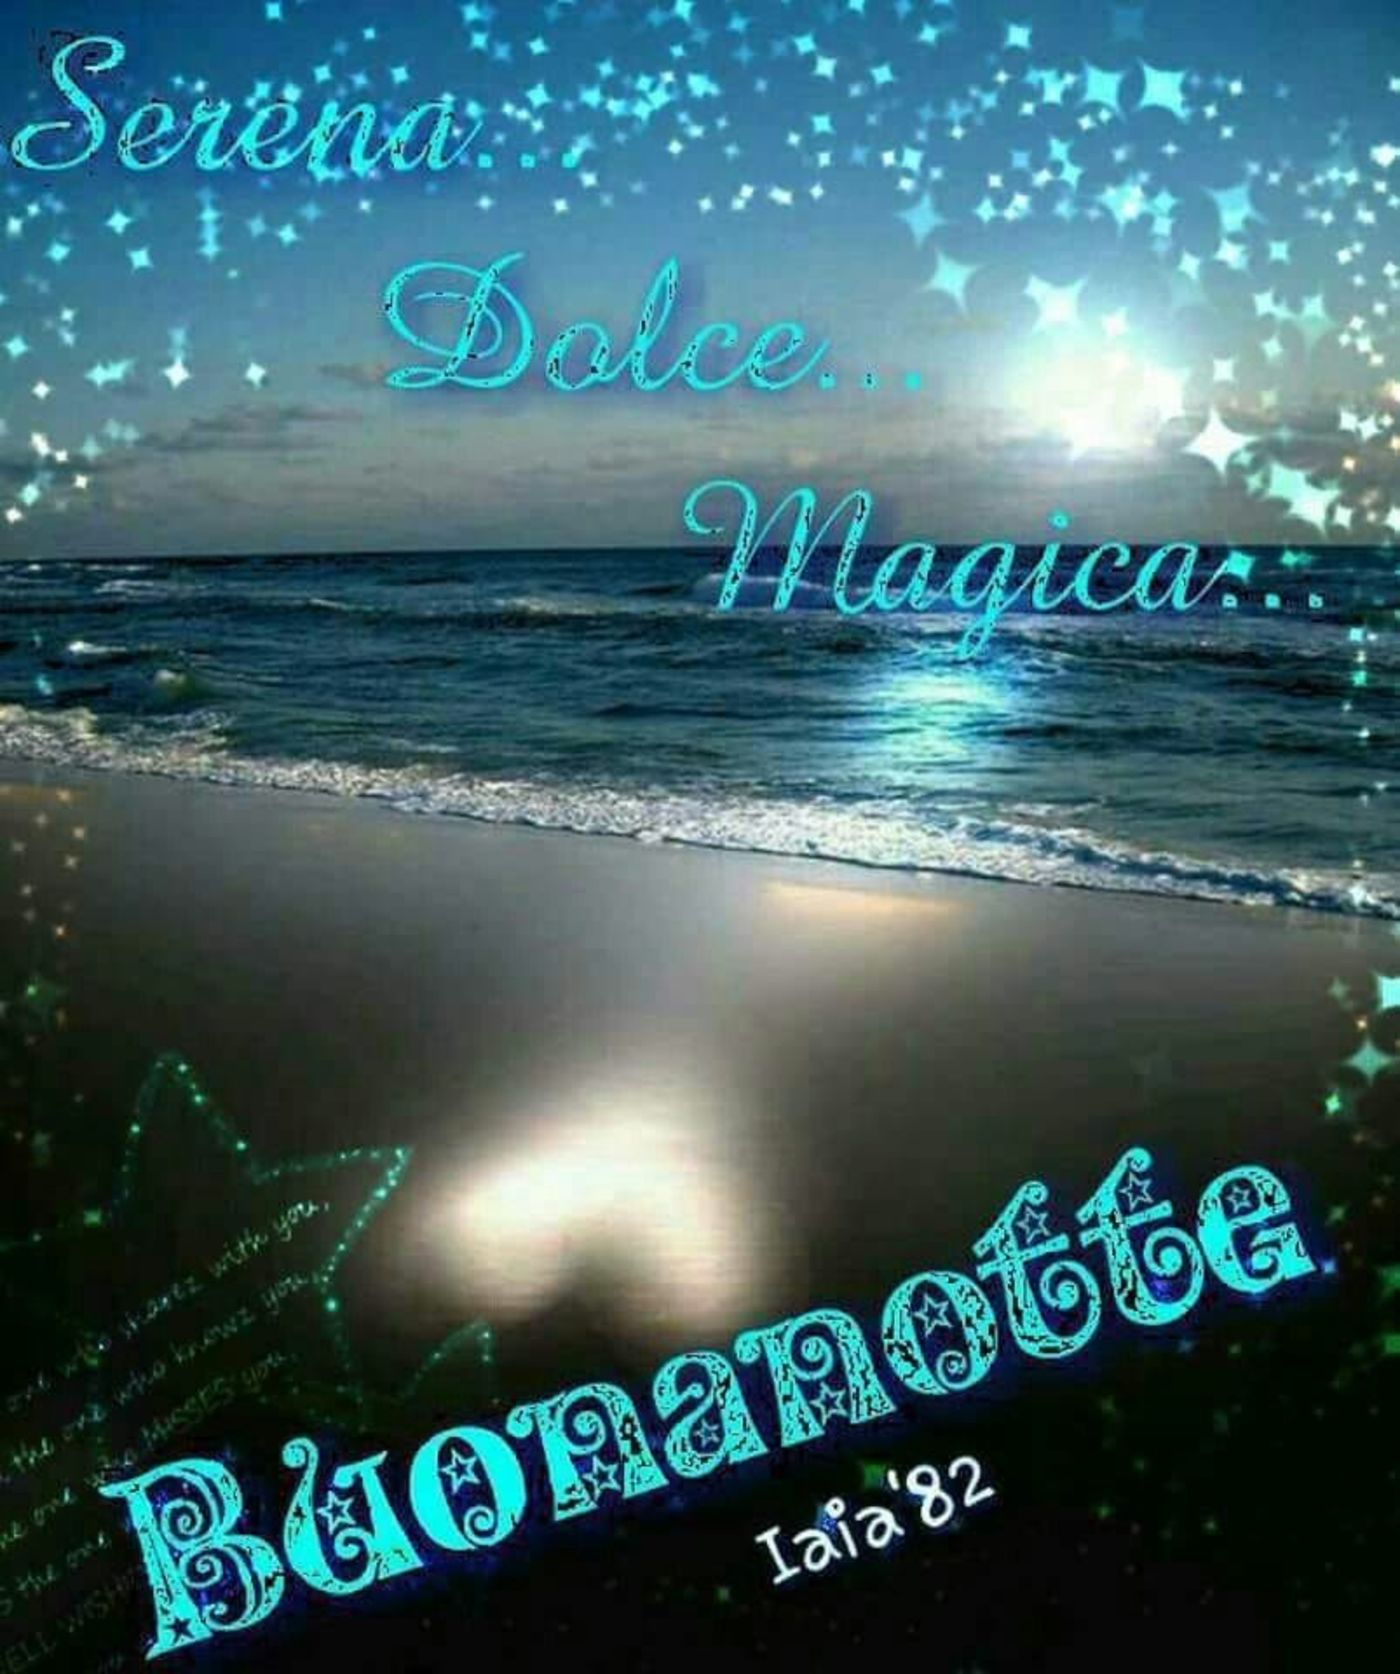 Buonanotte Frasi E Immagini Bellissime 9032